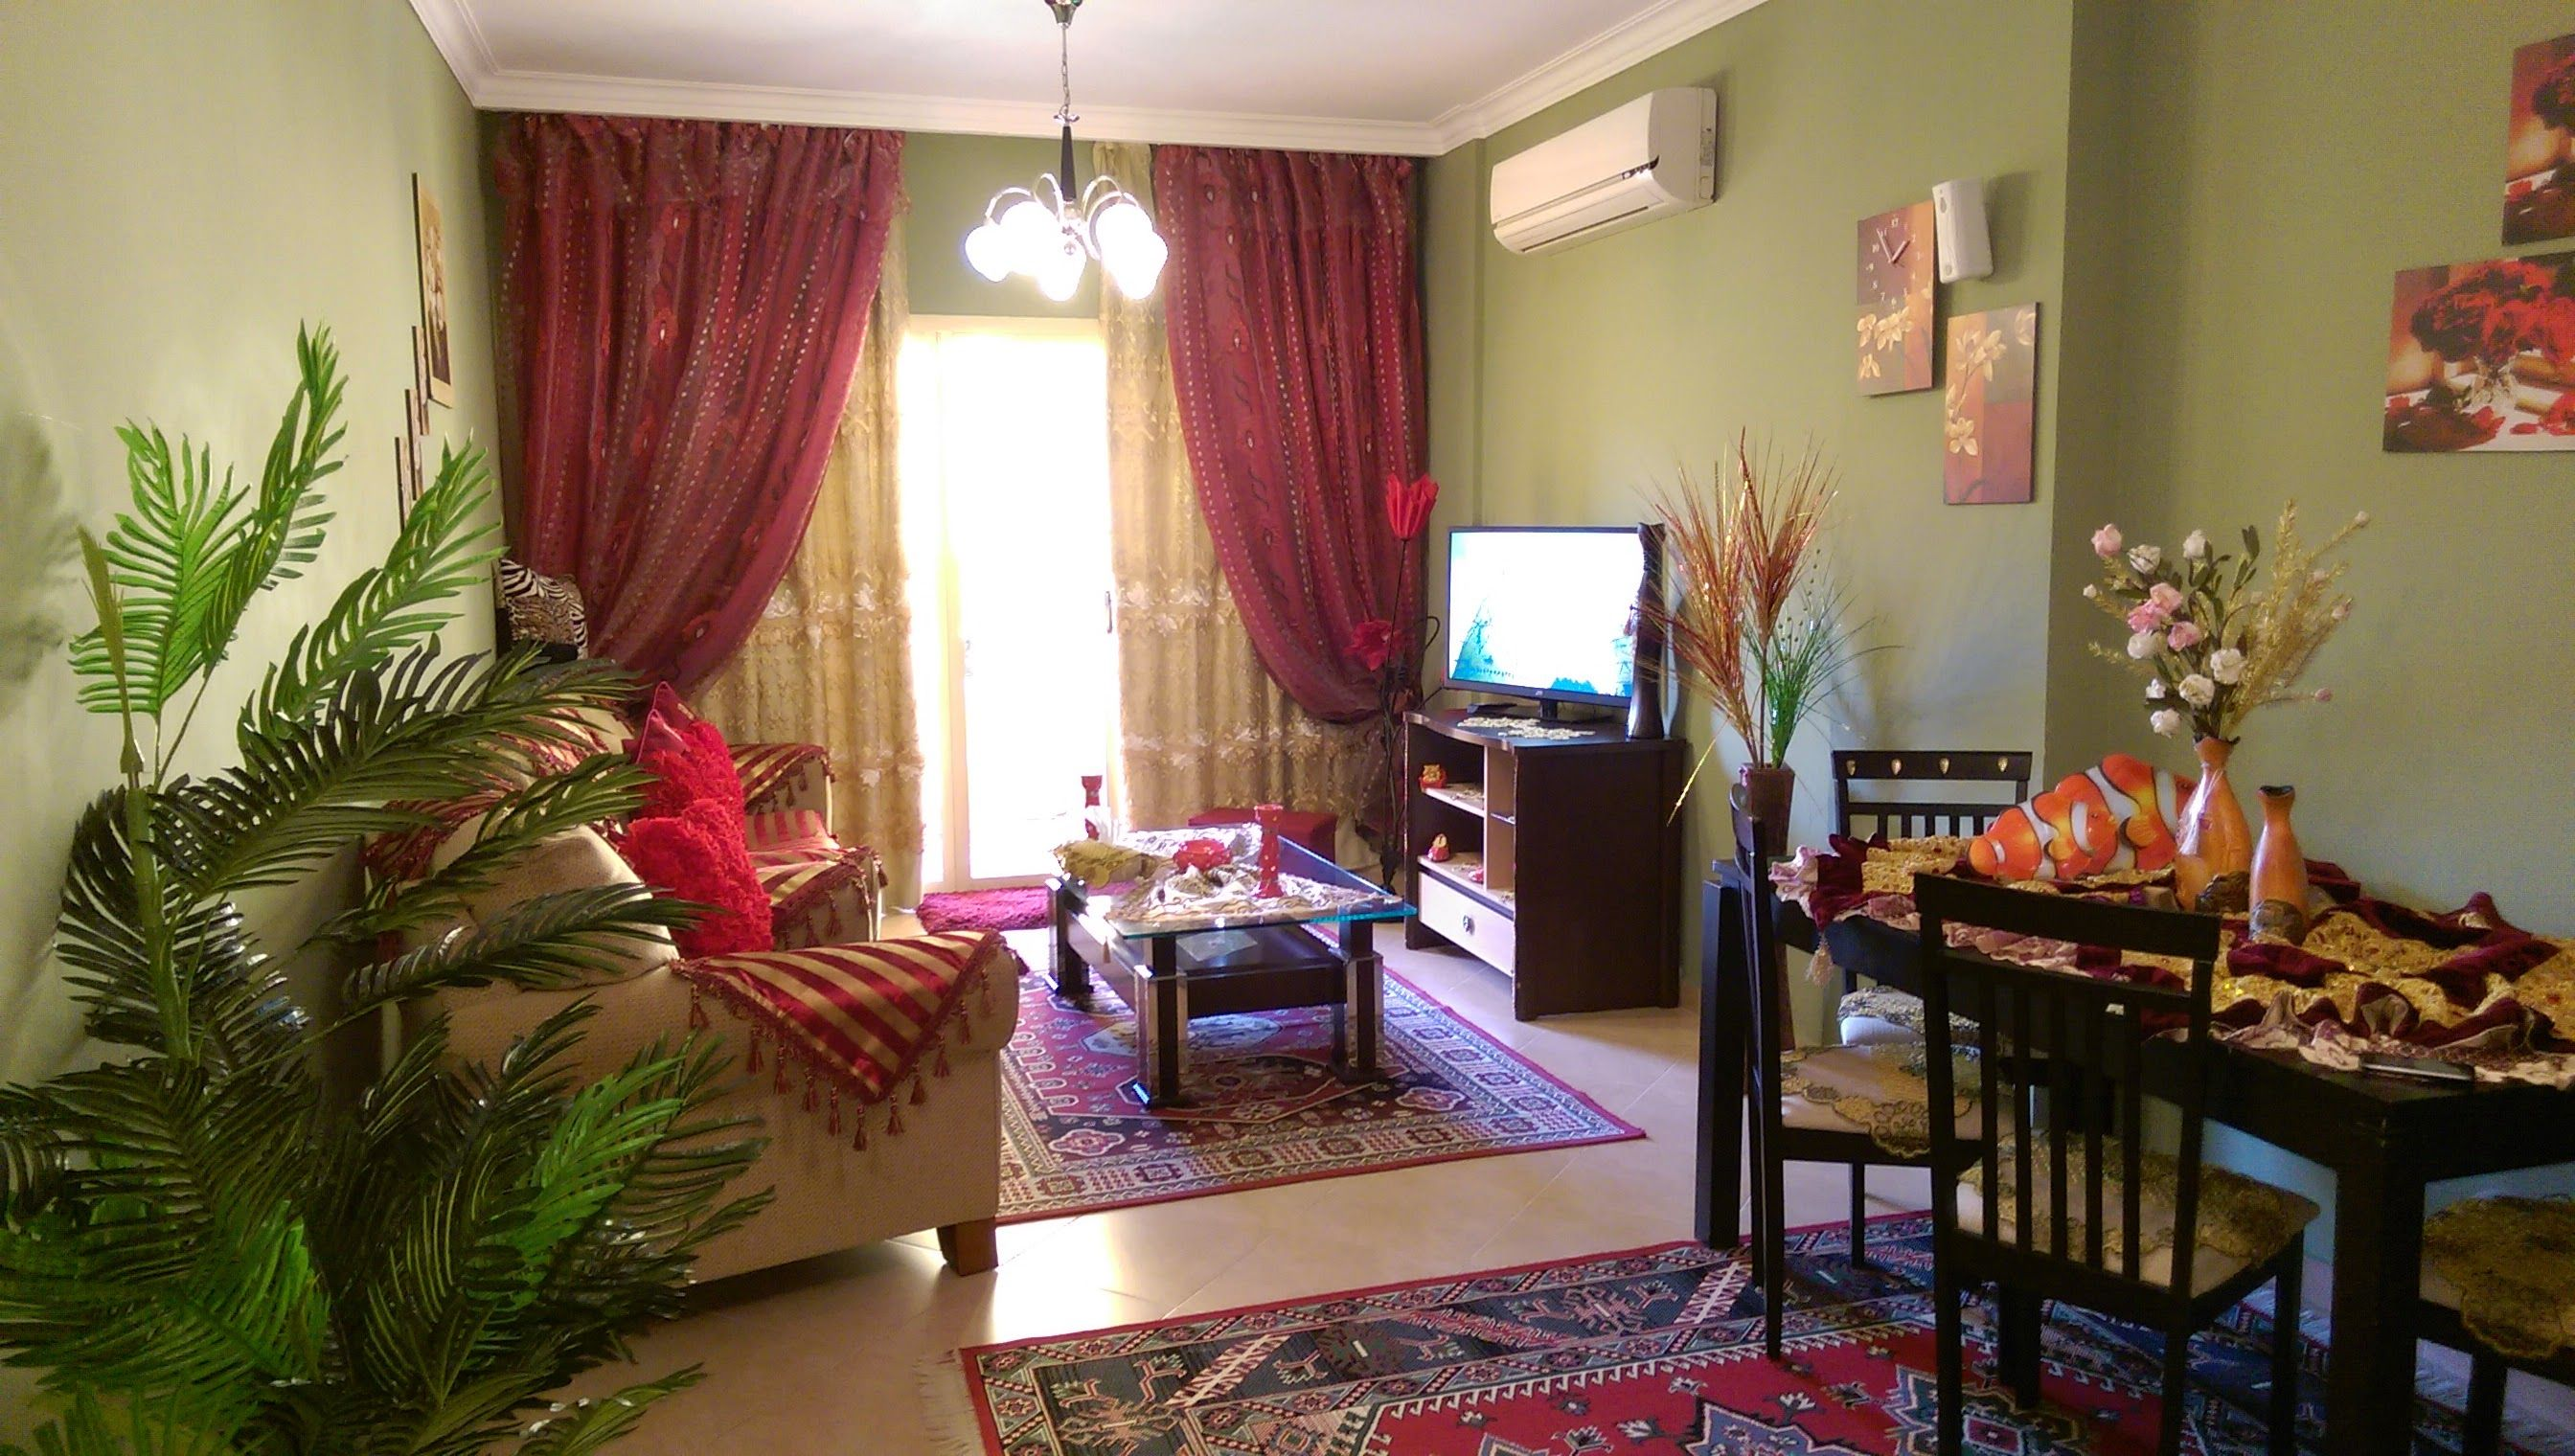 British Resort Apartments for sale, 2 bedroom apartment